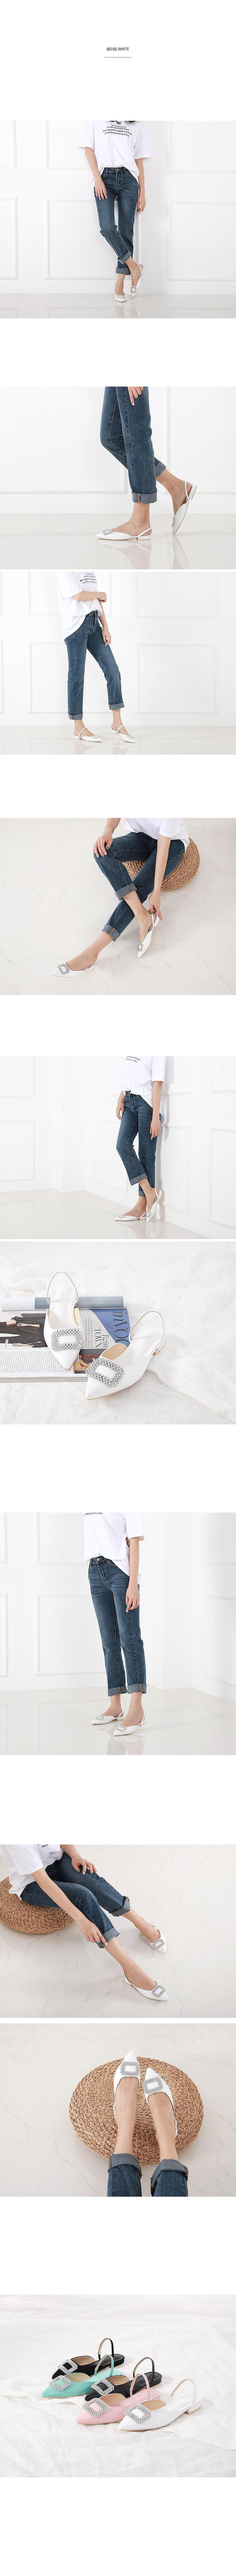 Isshu 2way Pointed Nose Square Fine Chom Cubic Gemstone Blower & Sling Bag Low Heel Sandal 2500